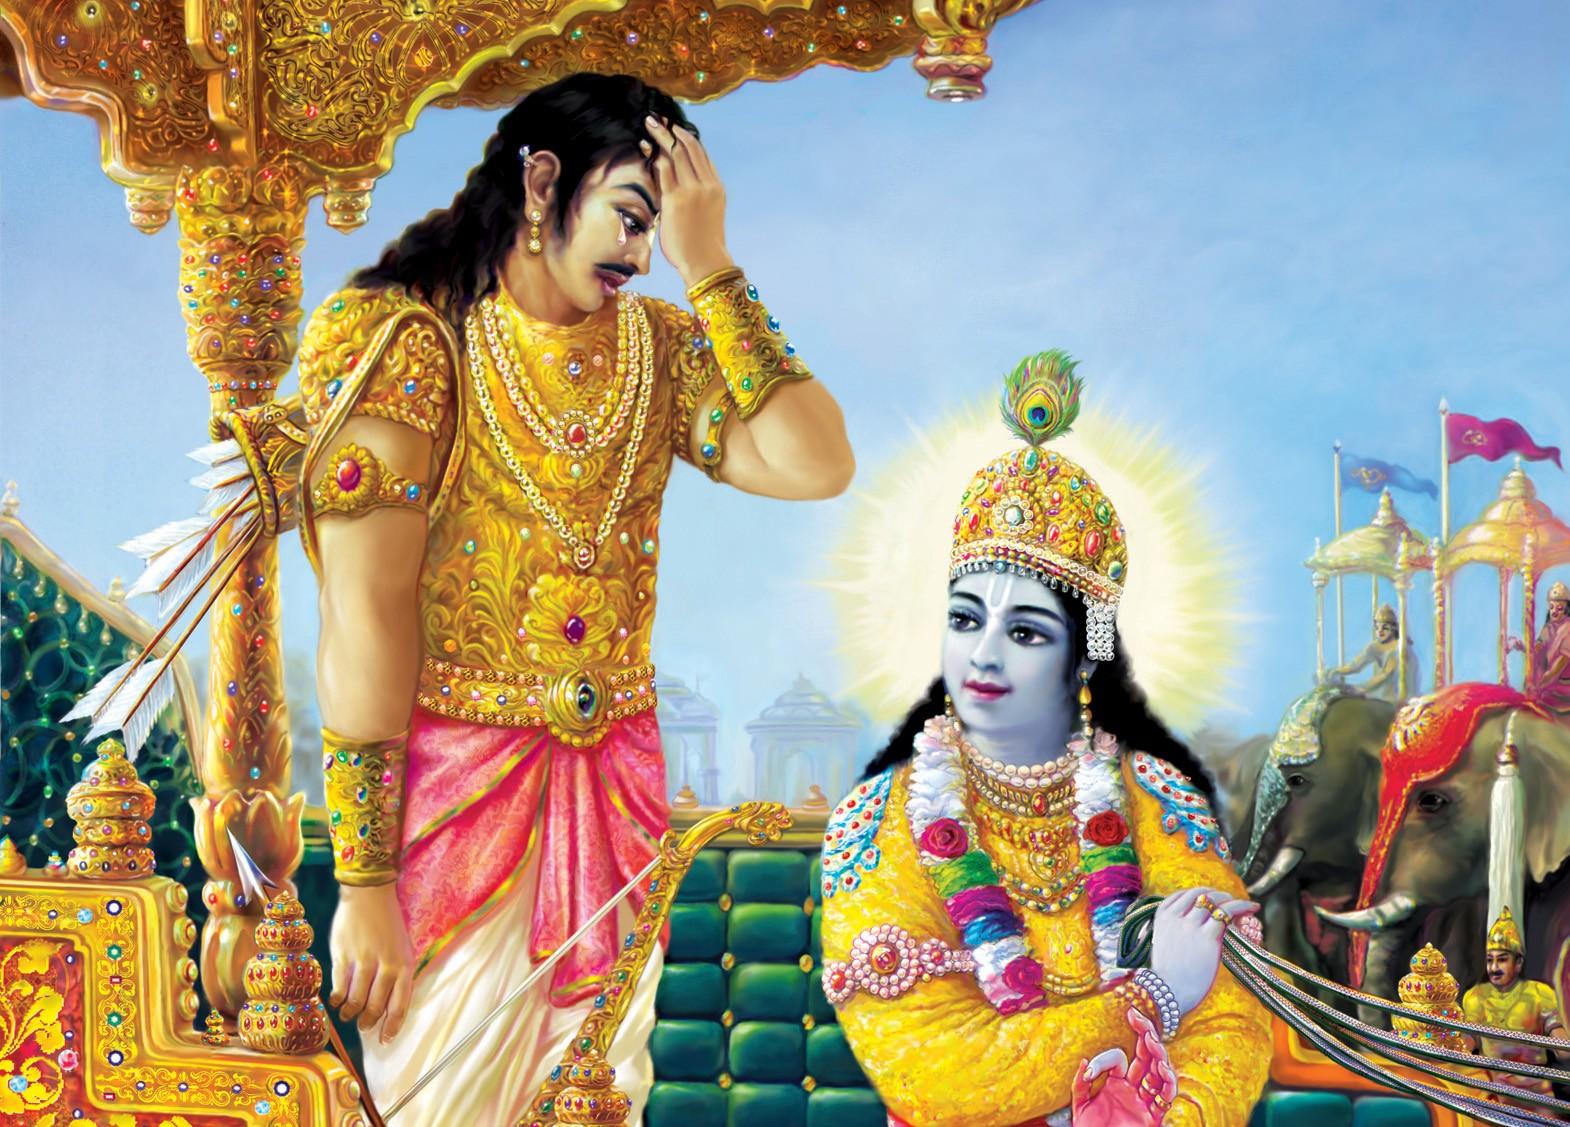 Bhagavad_gita_as_it_is_plate_09-e1371531068663.jpg